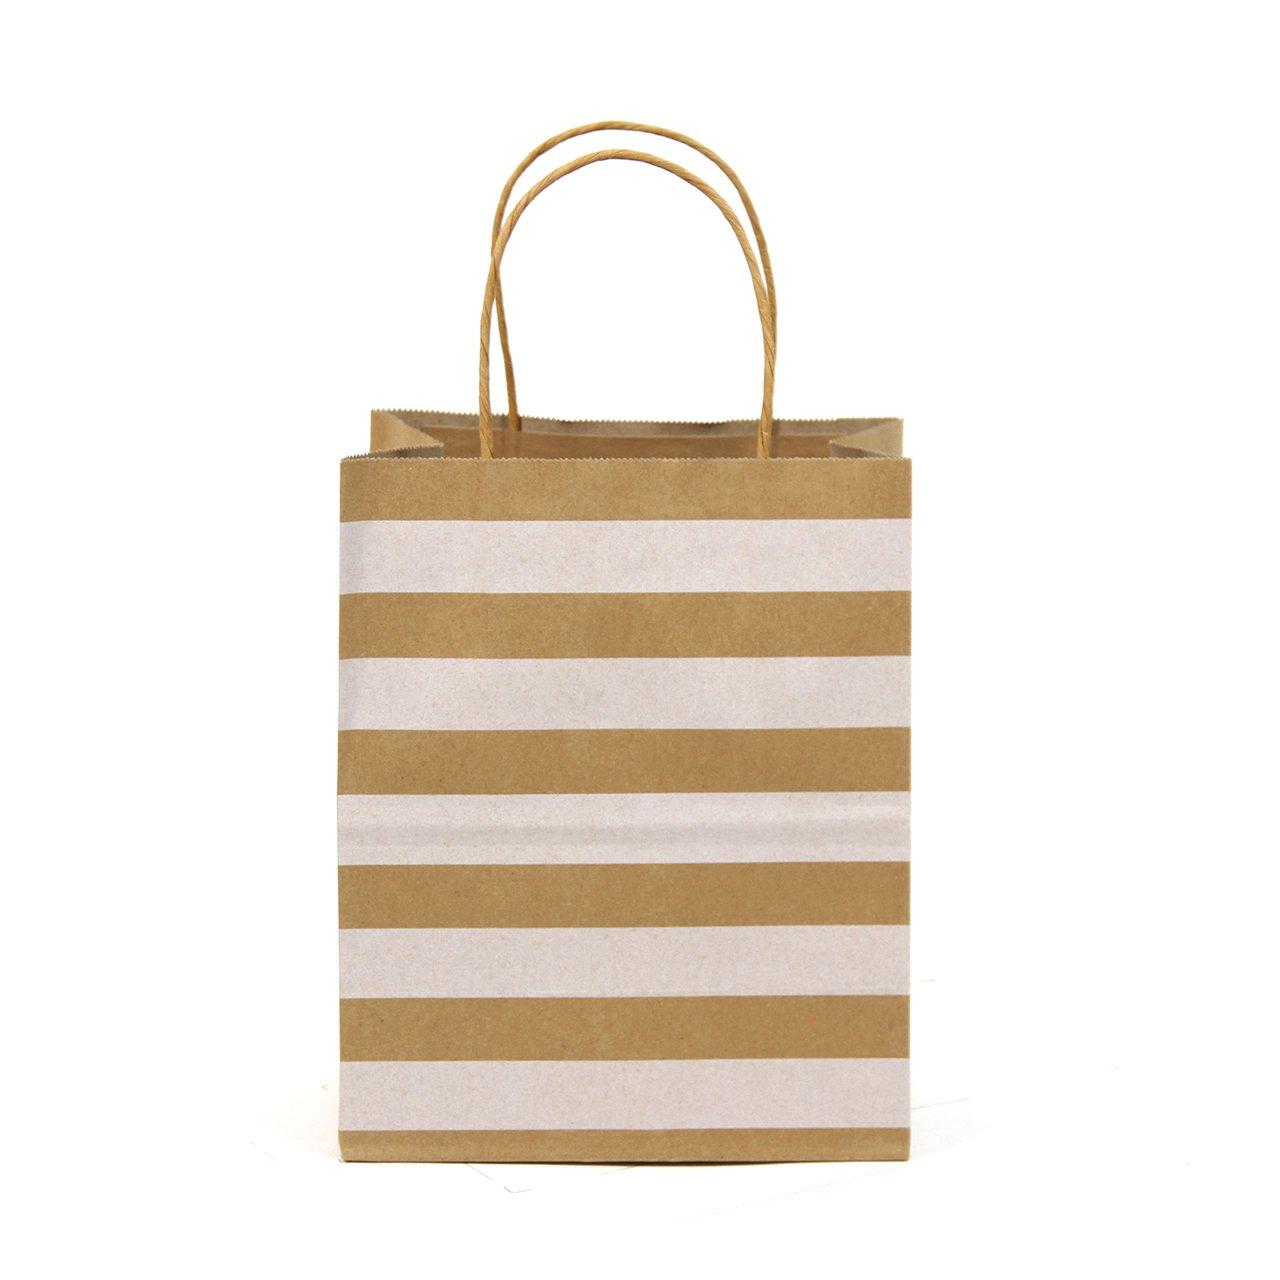 Premium Quality Natural Brown Kraft Bag, Birthday Party Gift Favor Bag Set, Biodegradable Paper (24CT, Stripe Medium)